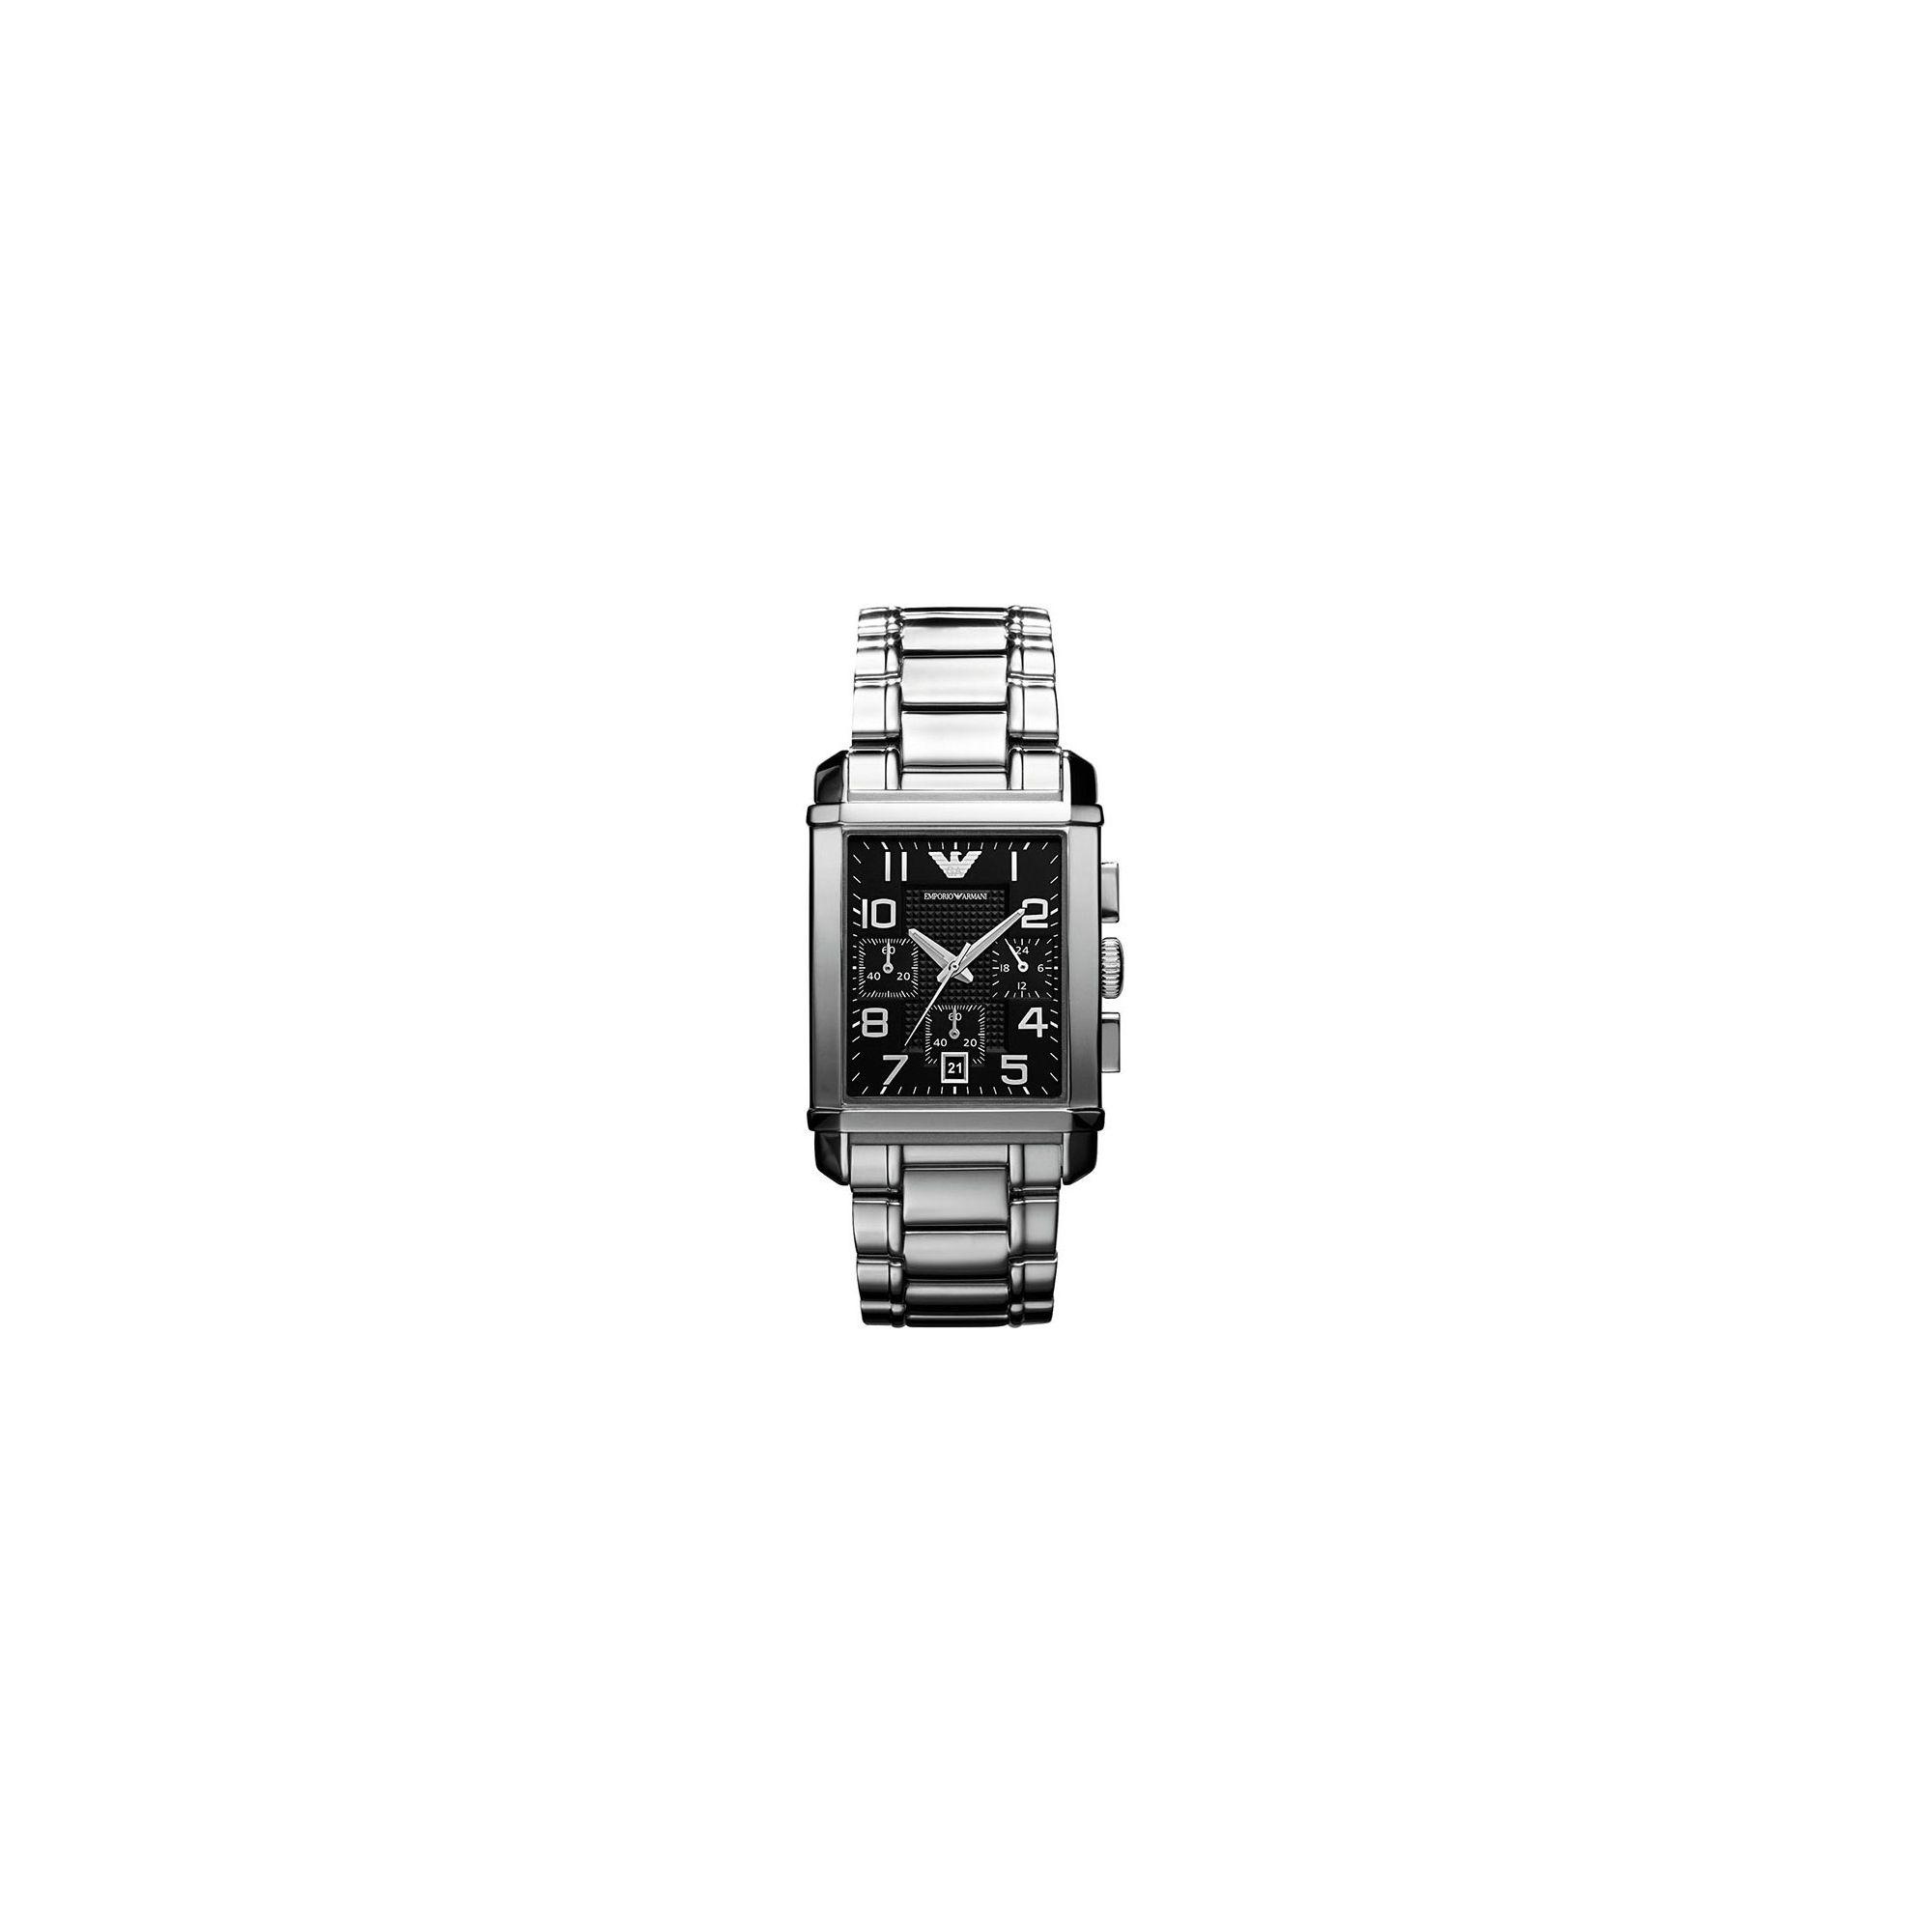 Emporio Armani Strap Watch AR0334 at Tesco Direct